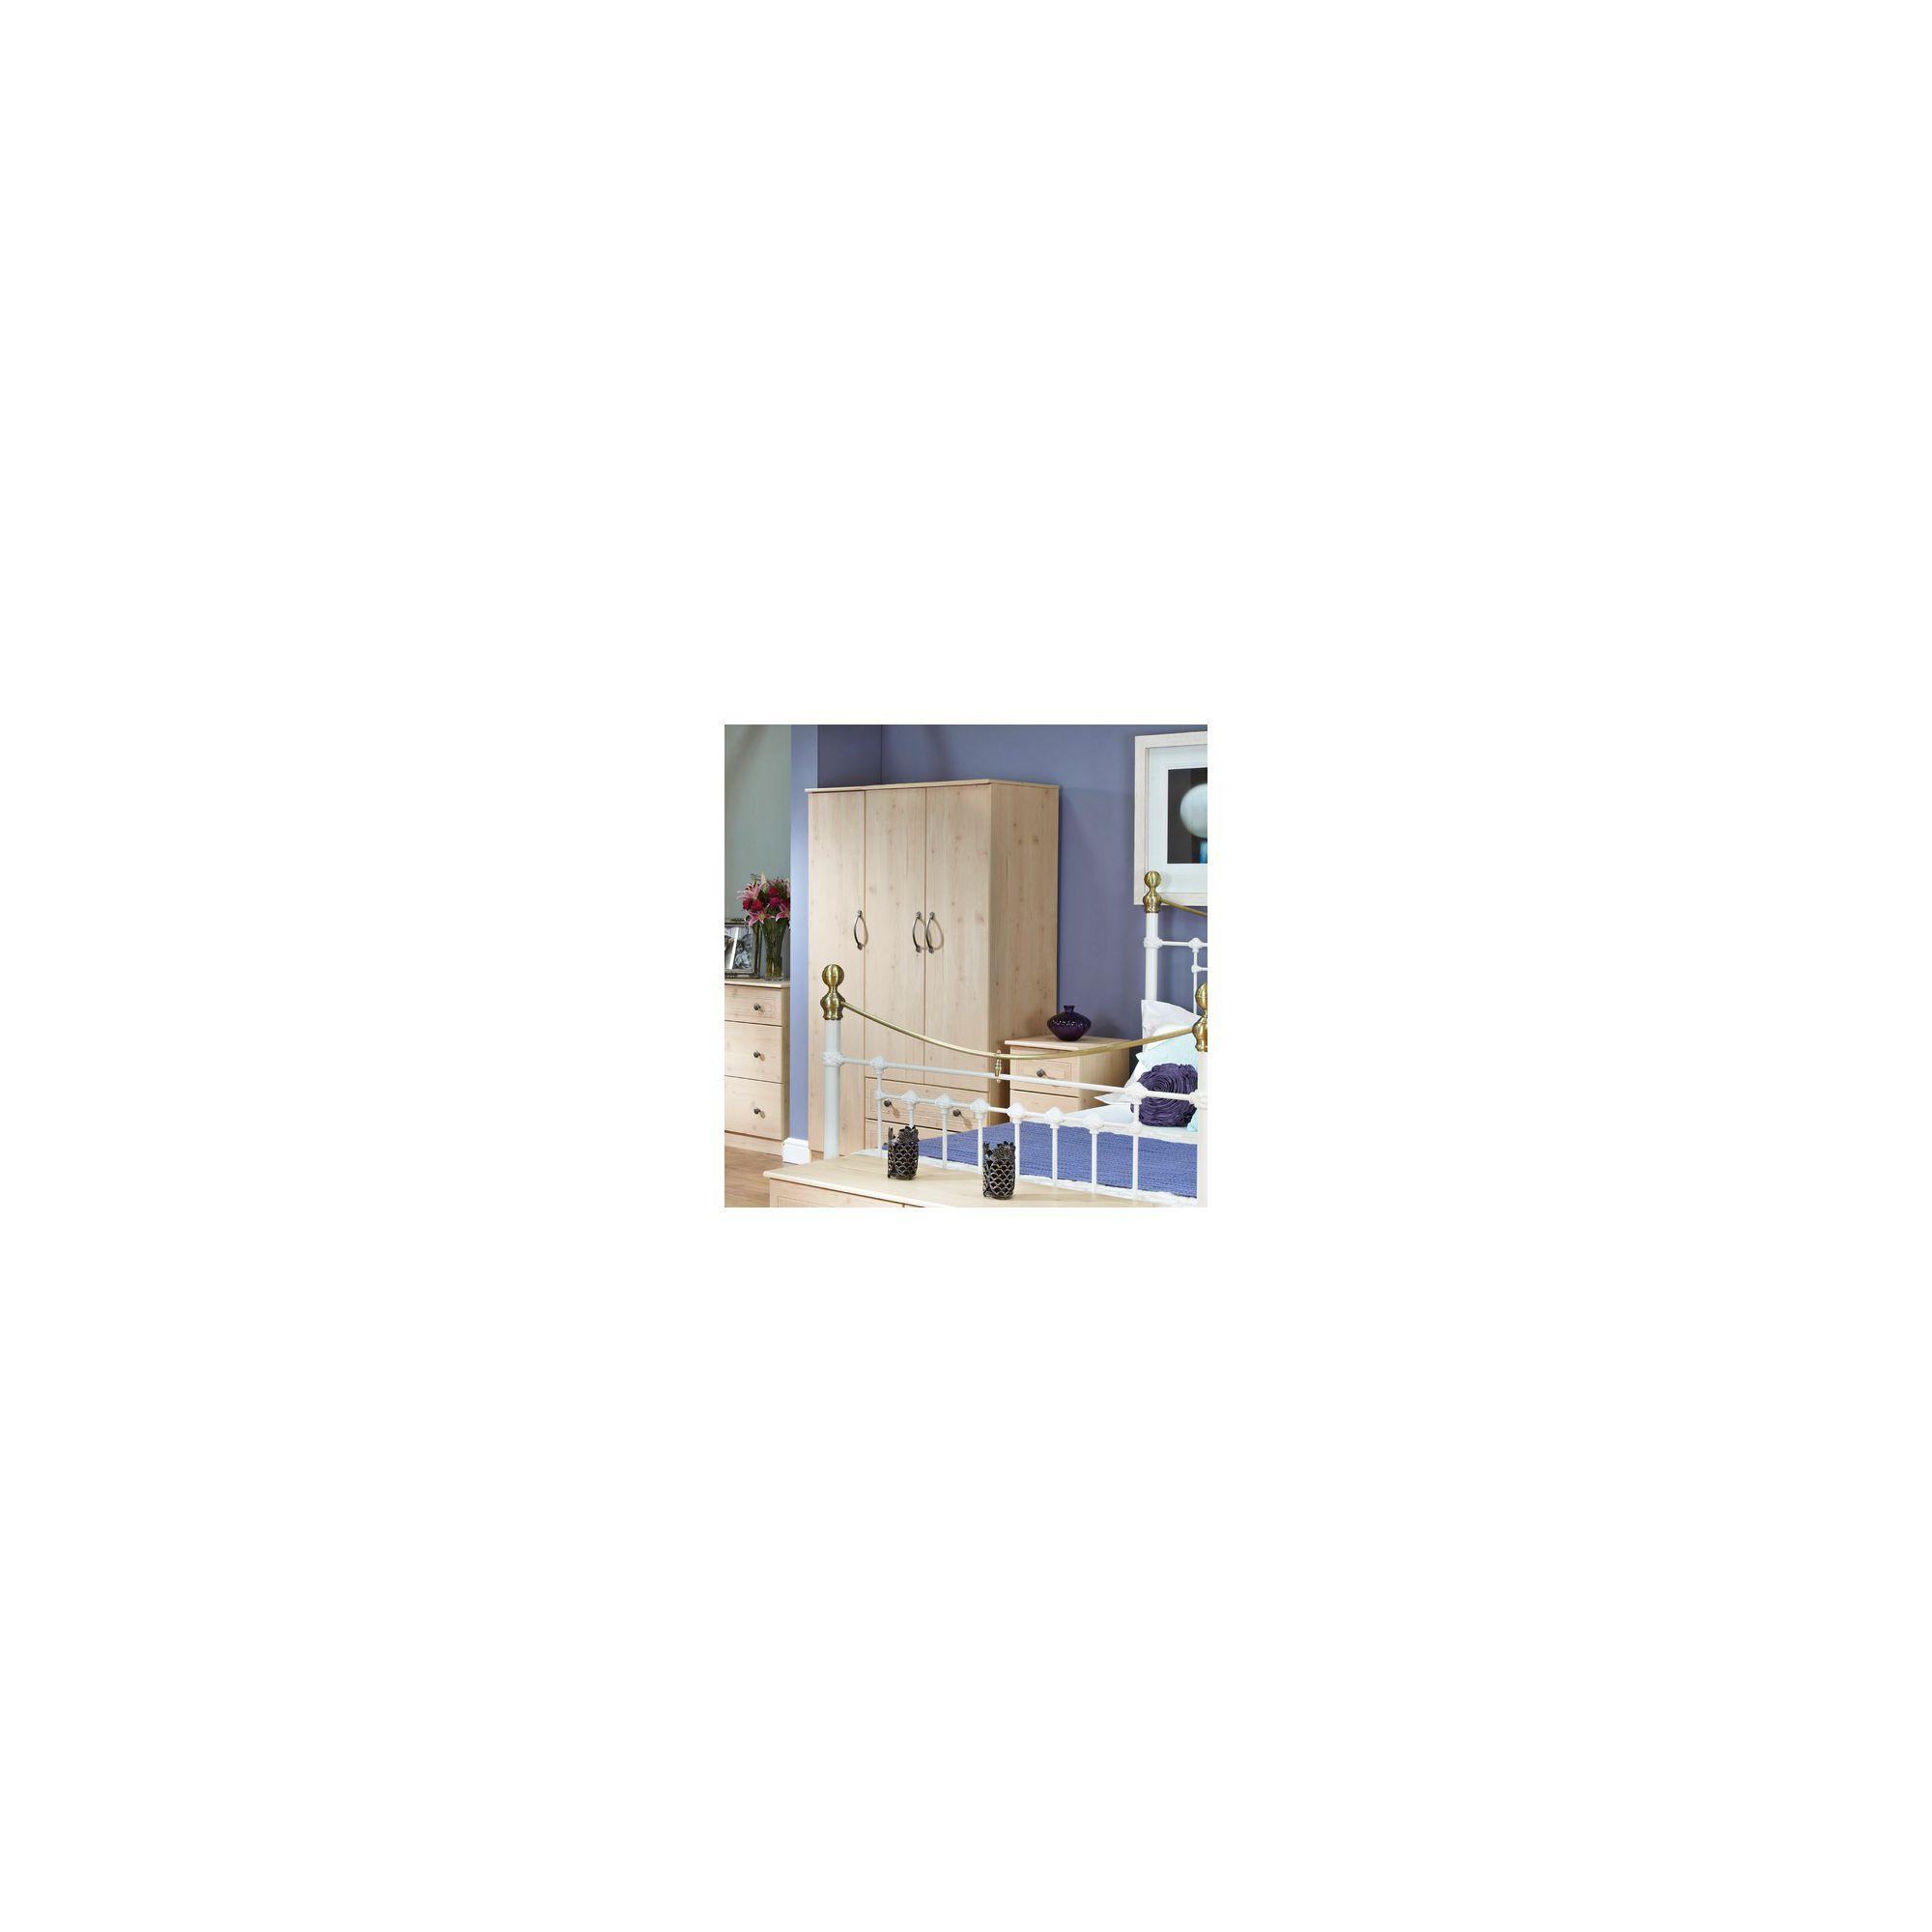 Welcome Furniture Florida 2 Drawer Wardrobe - 182.5cm H x 74cm W at Tesco Direct